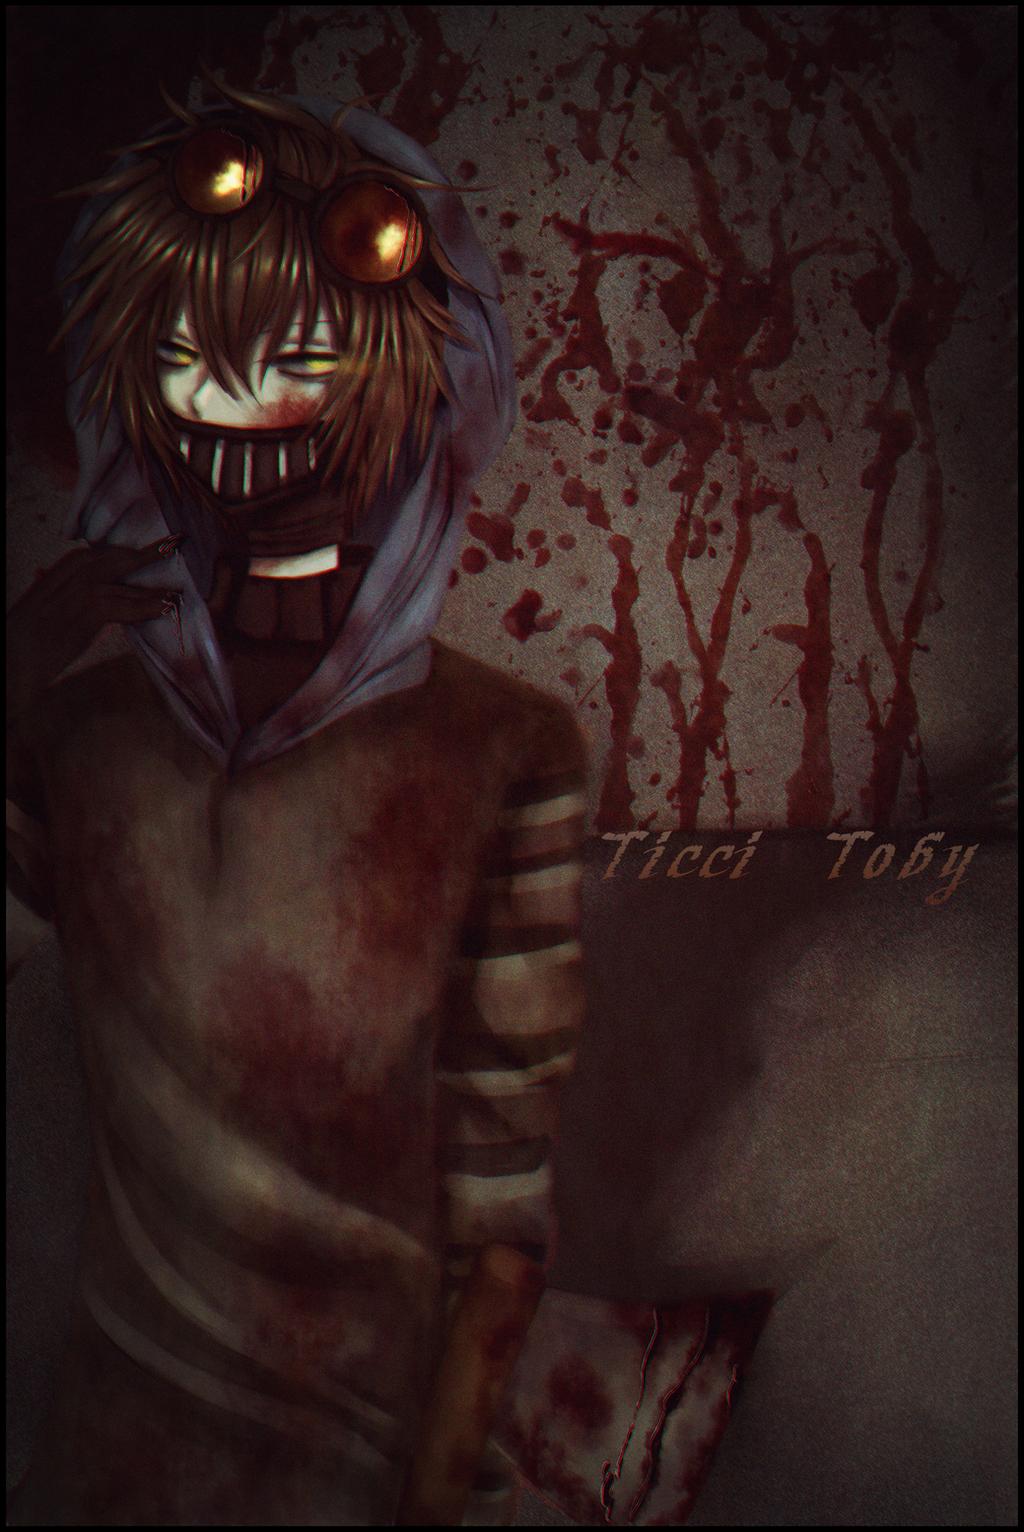 Ticci Toby. by TenshiAya on DeviantArt